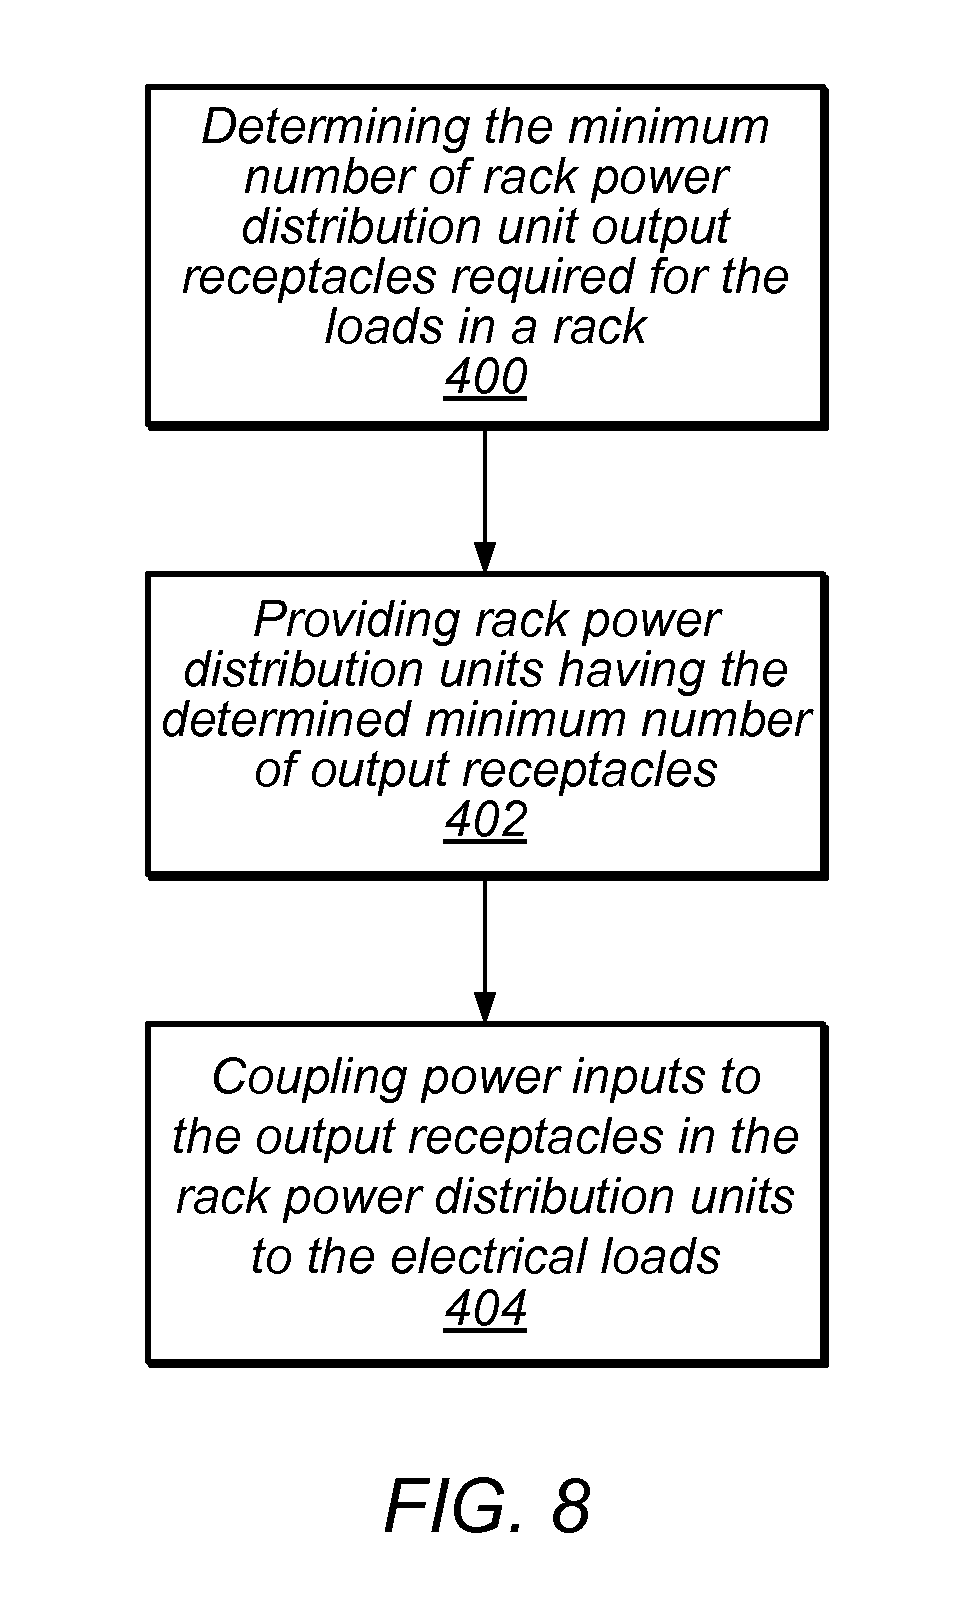 Patent US 8,836,175 B1